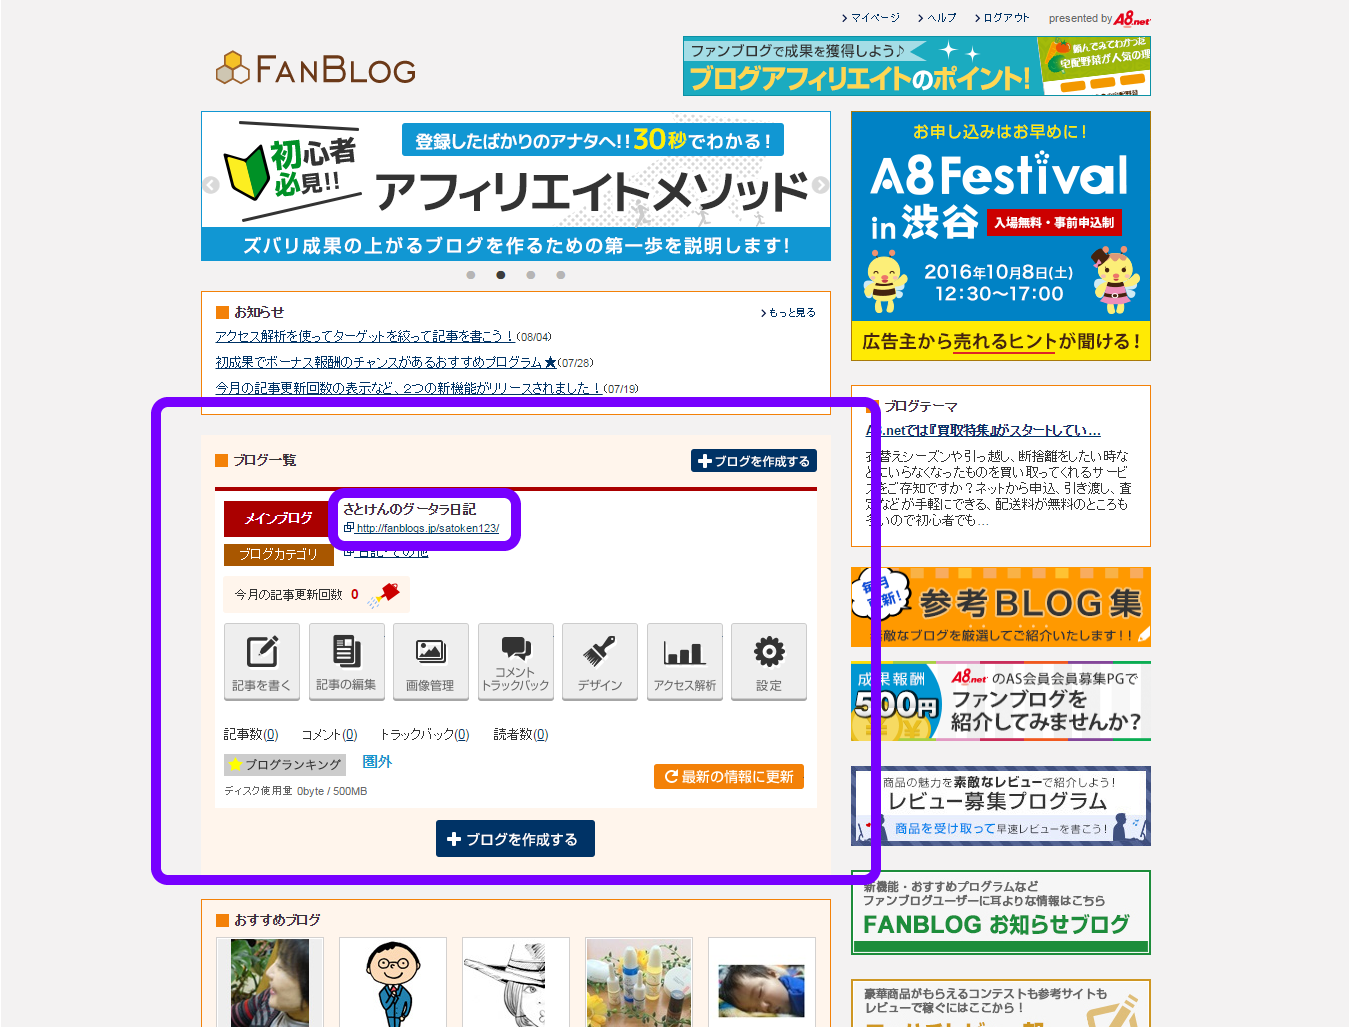 fanblog_01c